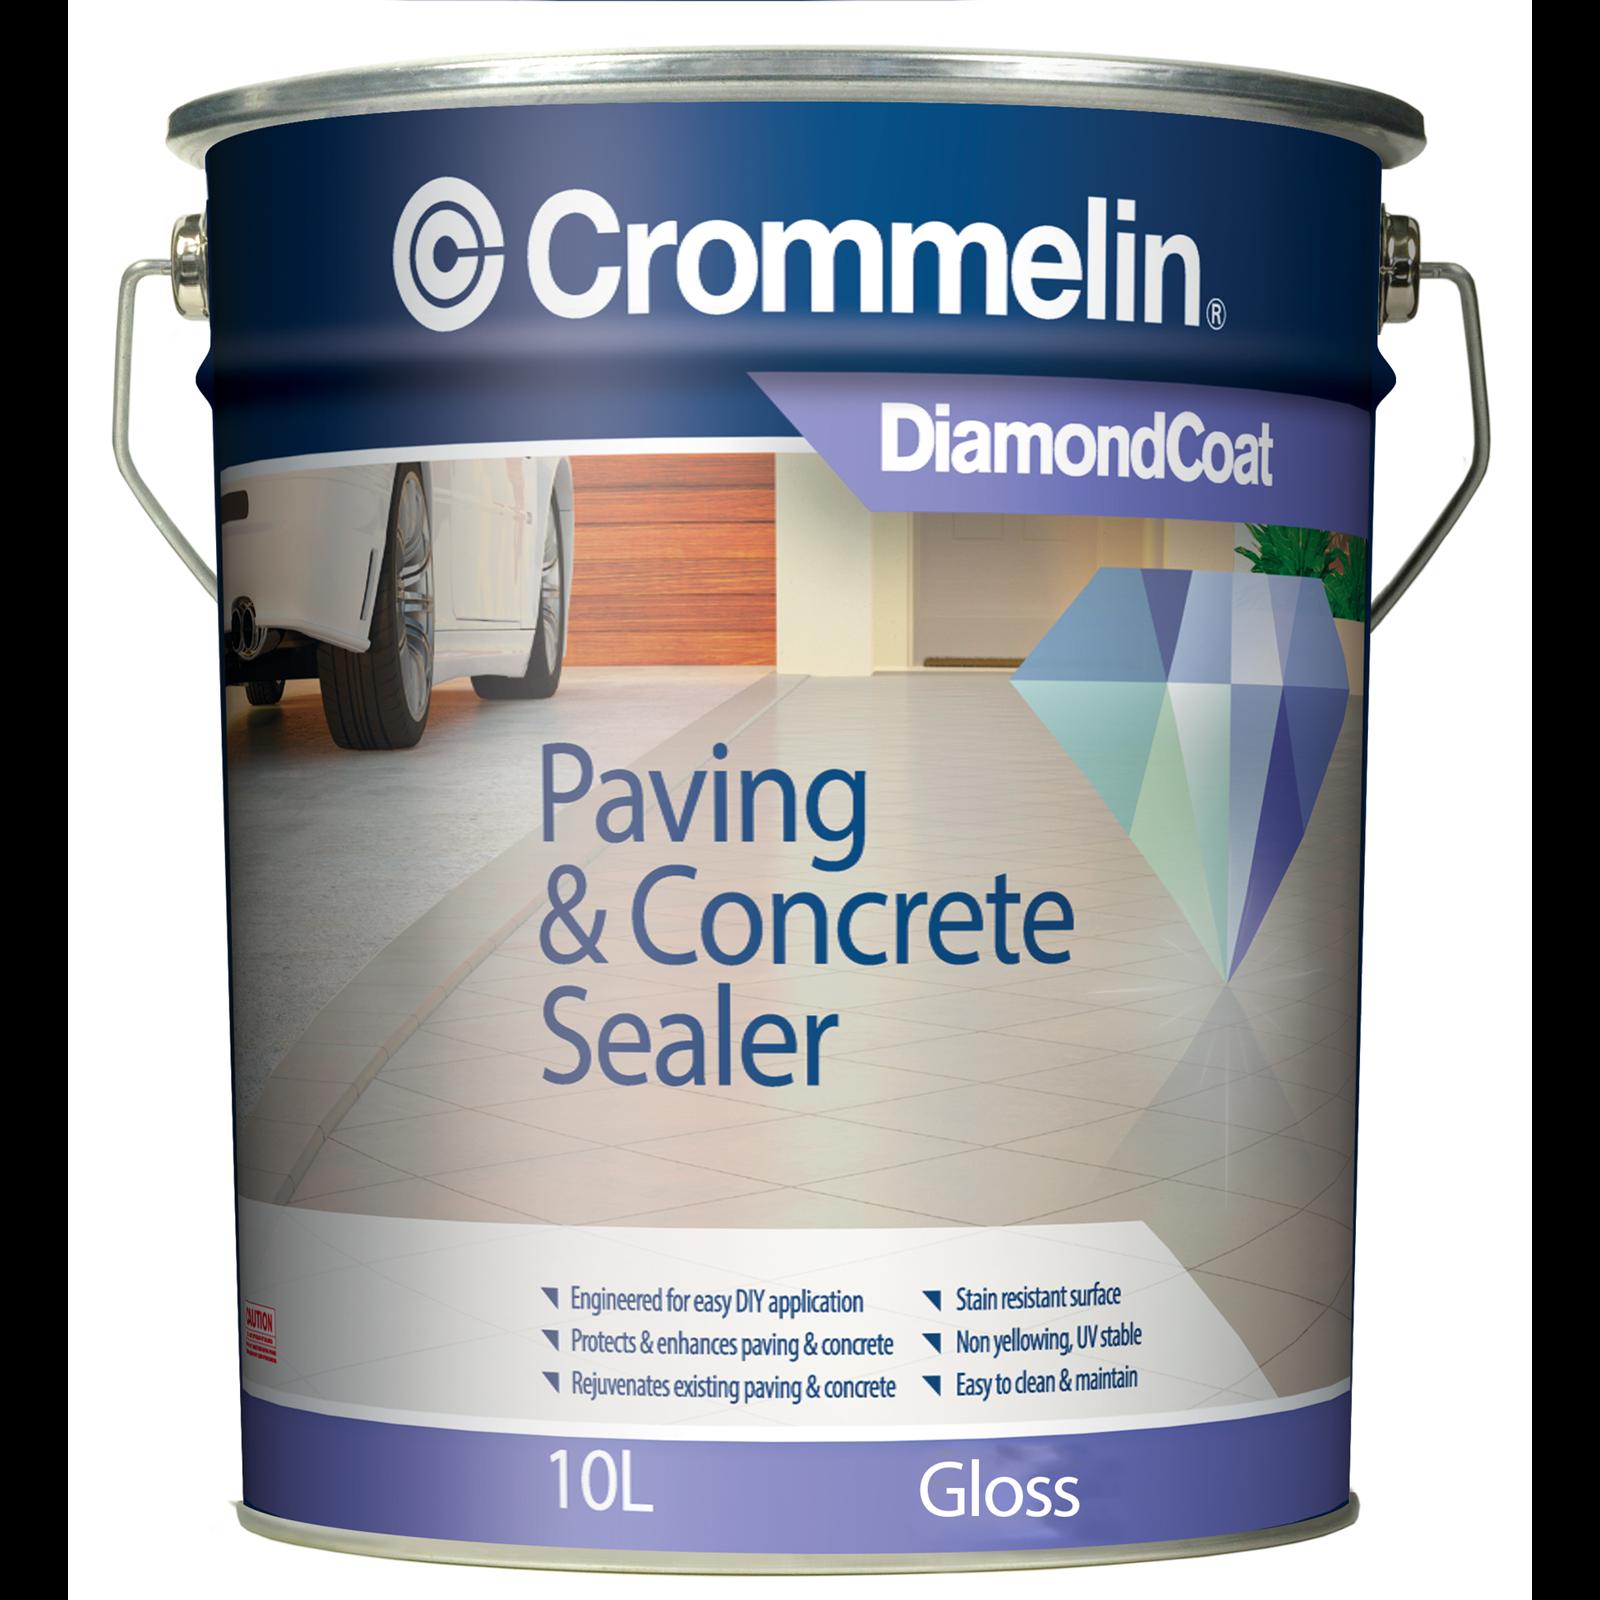 Crommelin 10L Gloss DiamondCoat Paving And Concrete Sealer